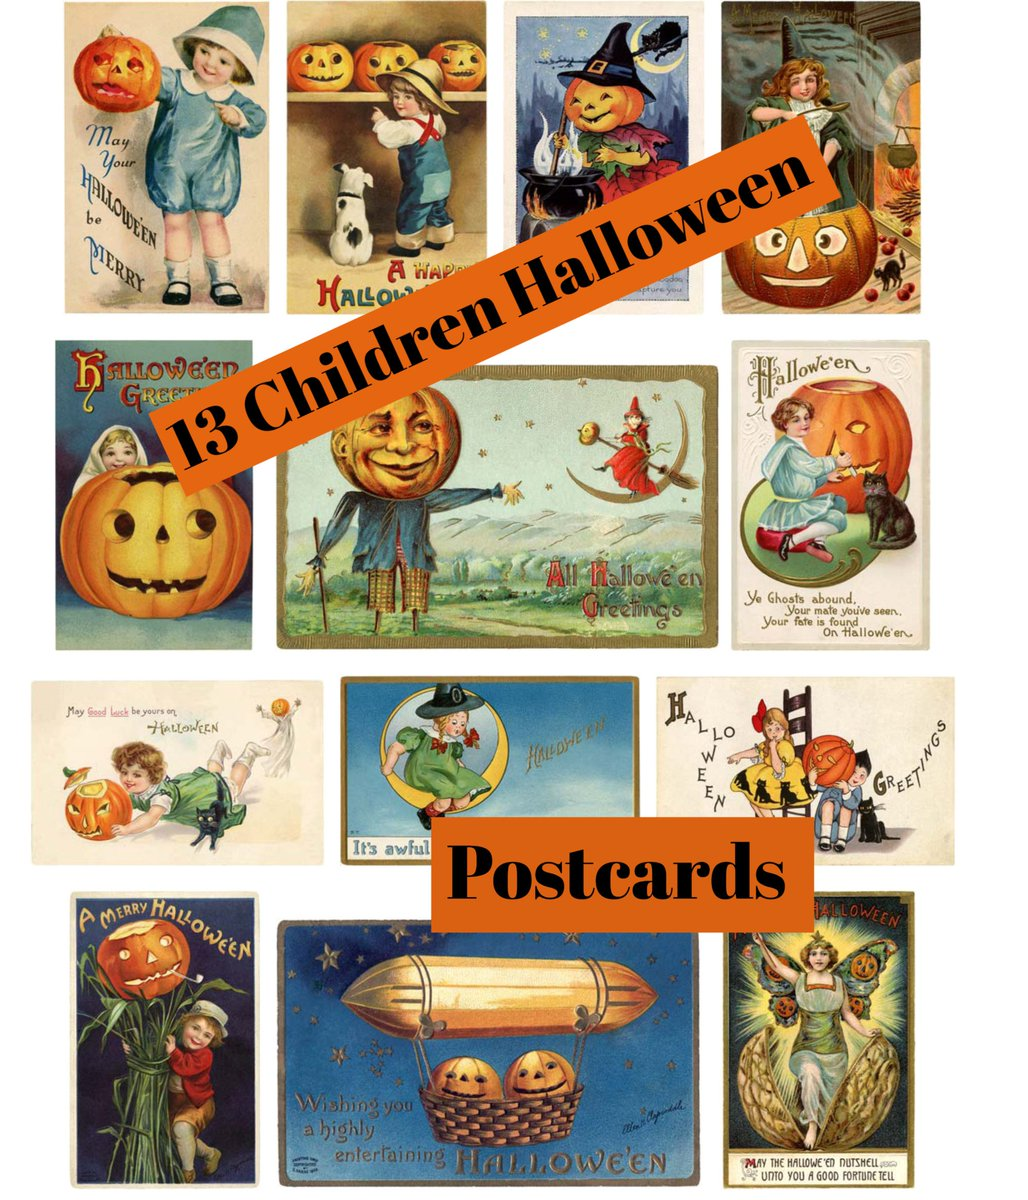 Retro Vintage Halloween Clip Art.One Retro Lady Etsy On Twitter Fun New Listing Vintage Halloween